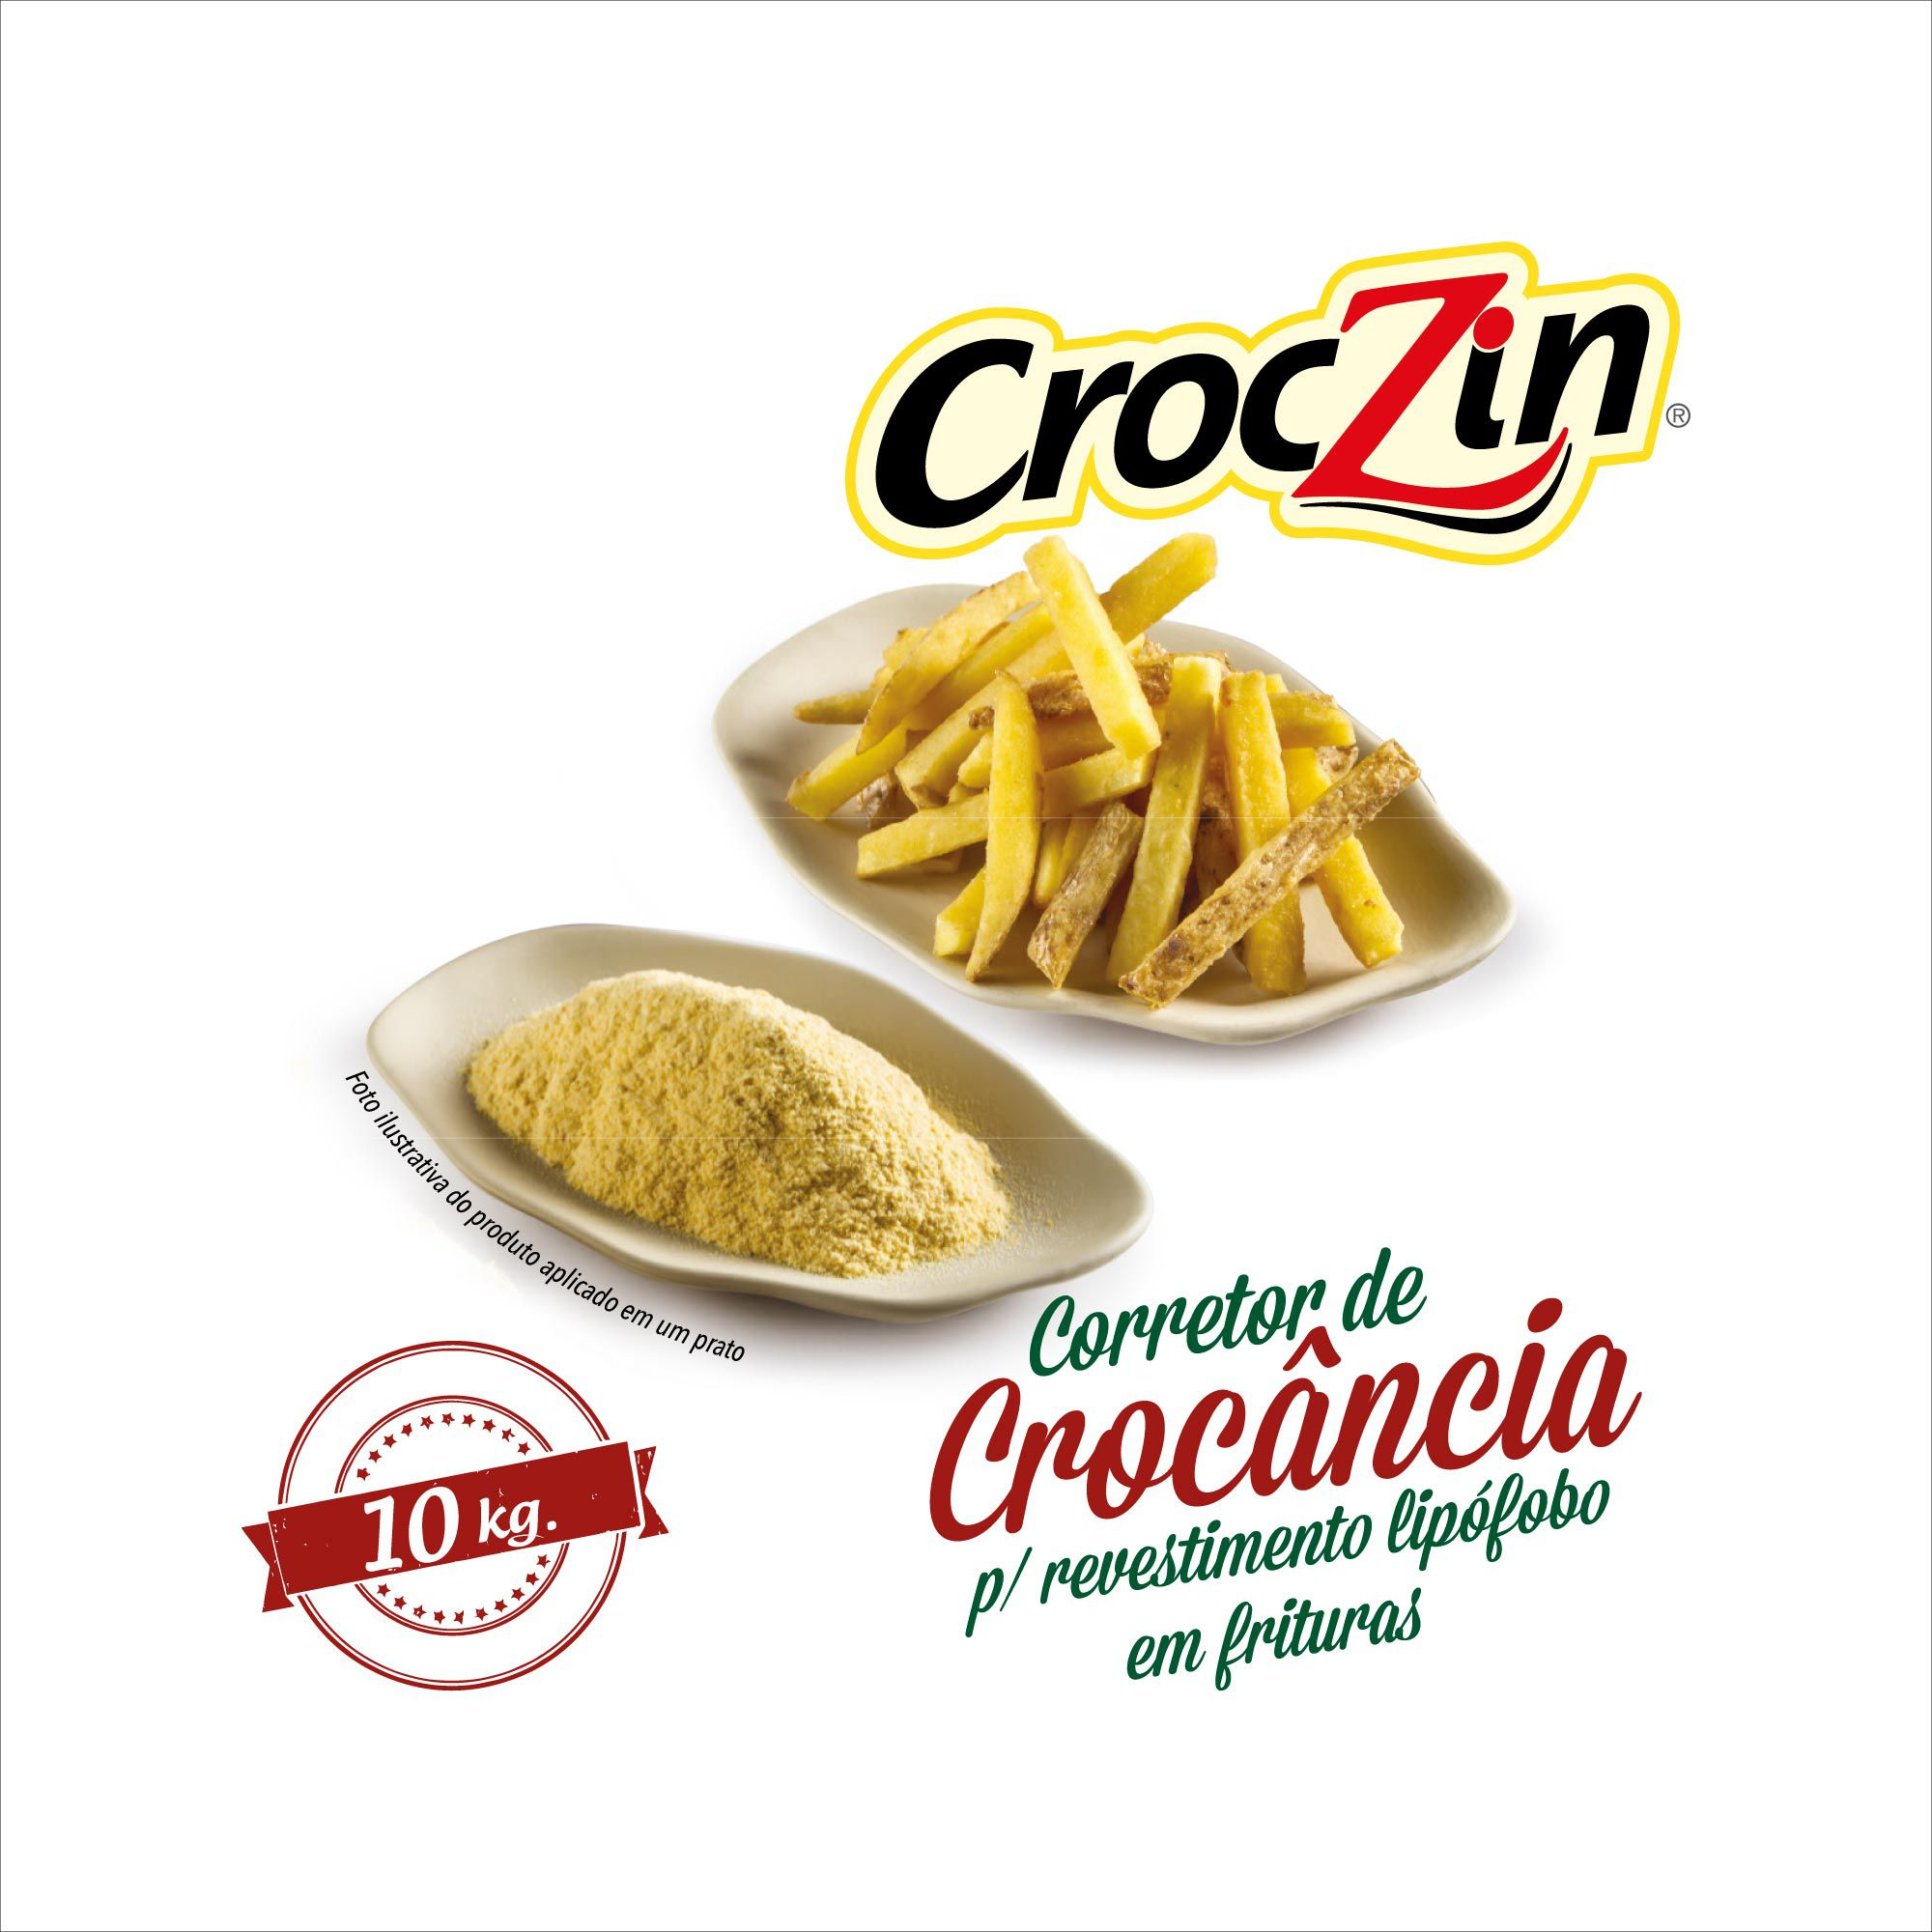 Croczin 10kg